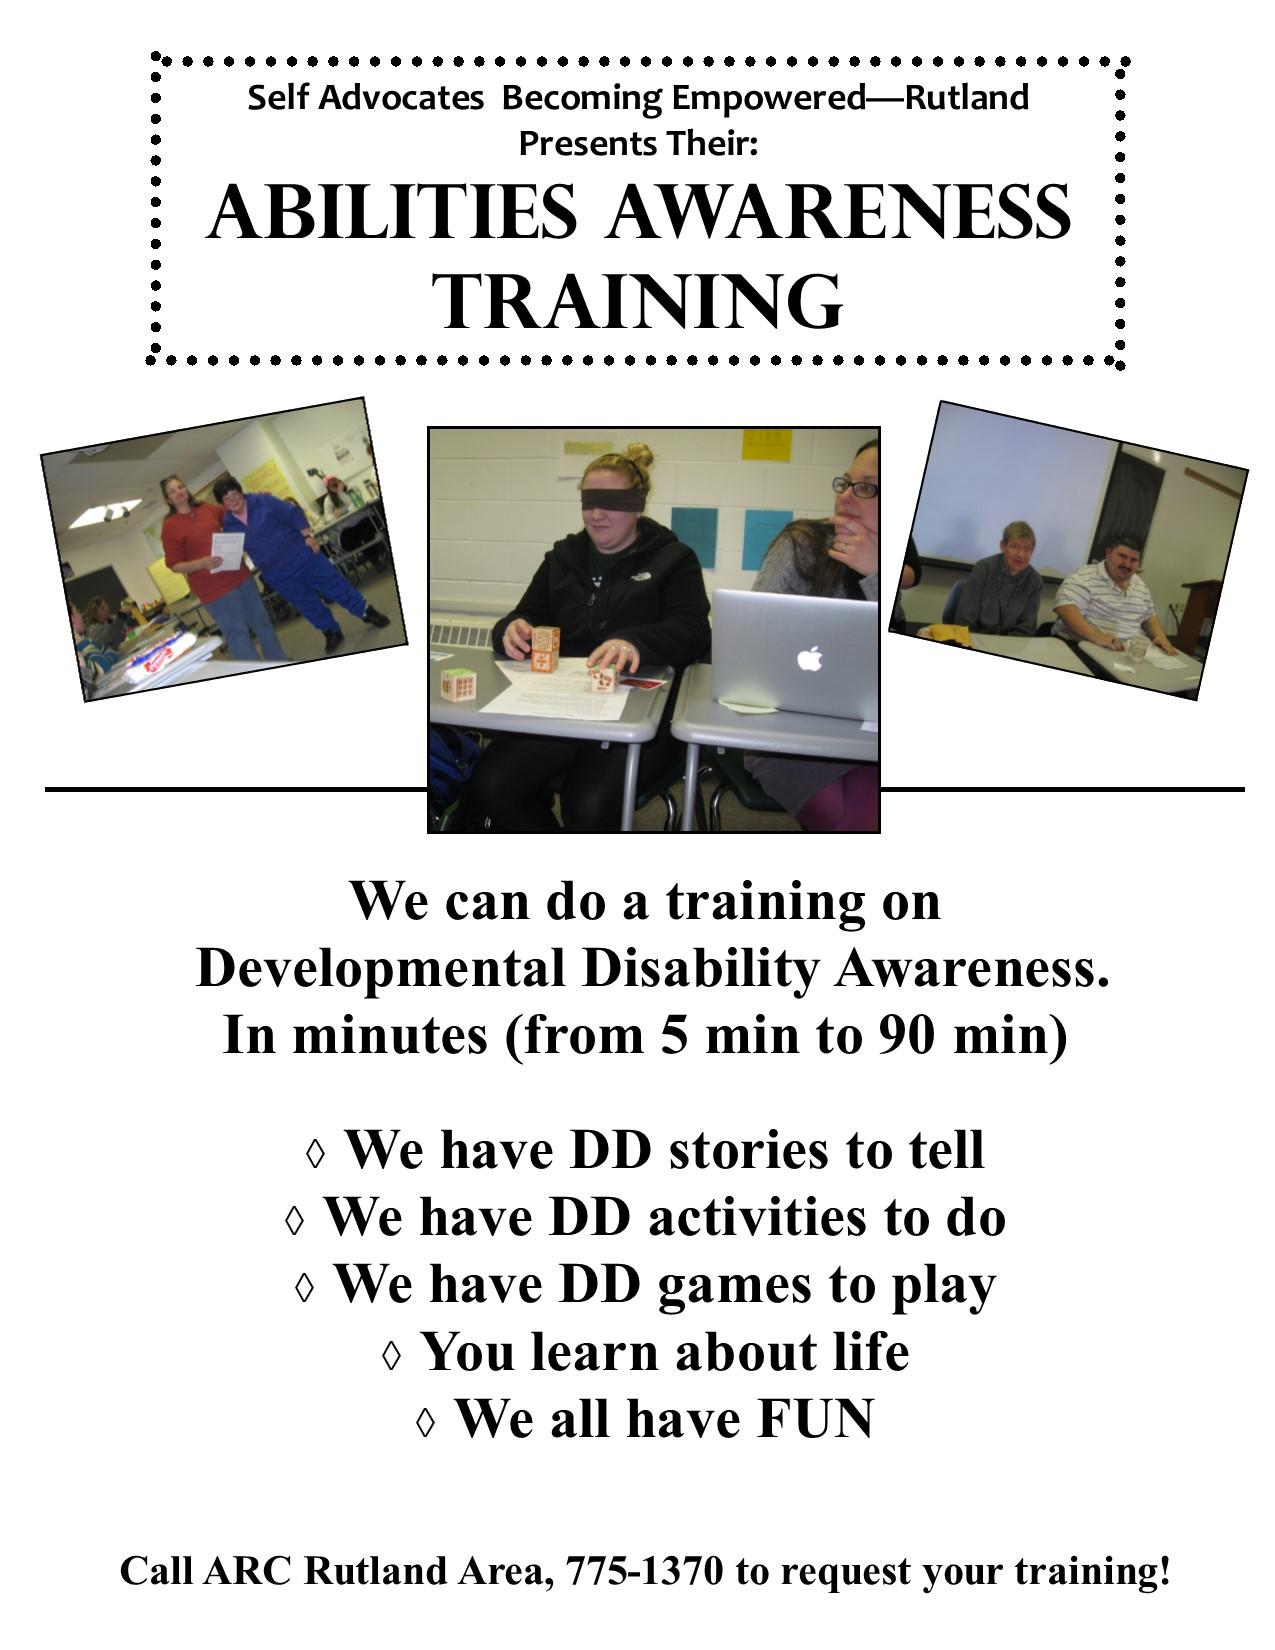 ARC of the Rutland Area Abilities Awareness Training.